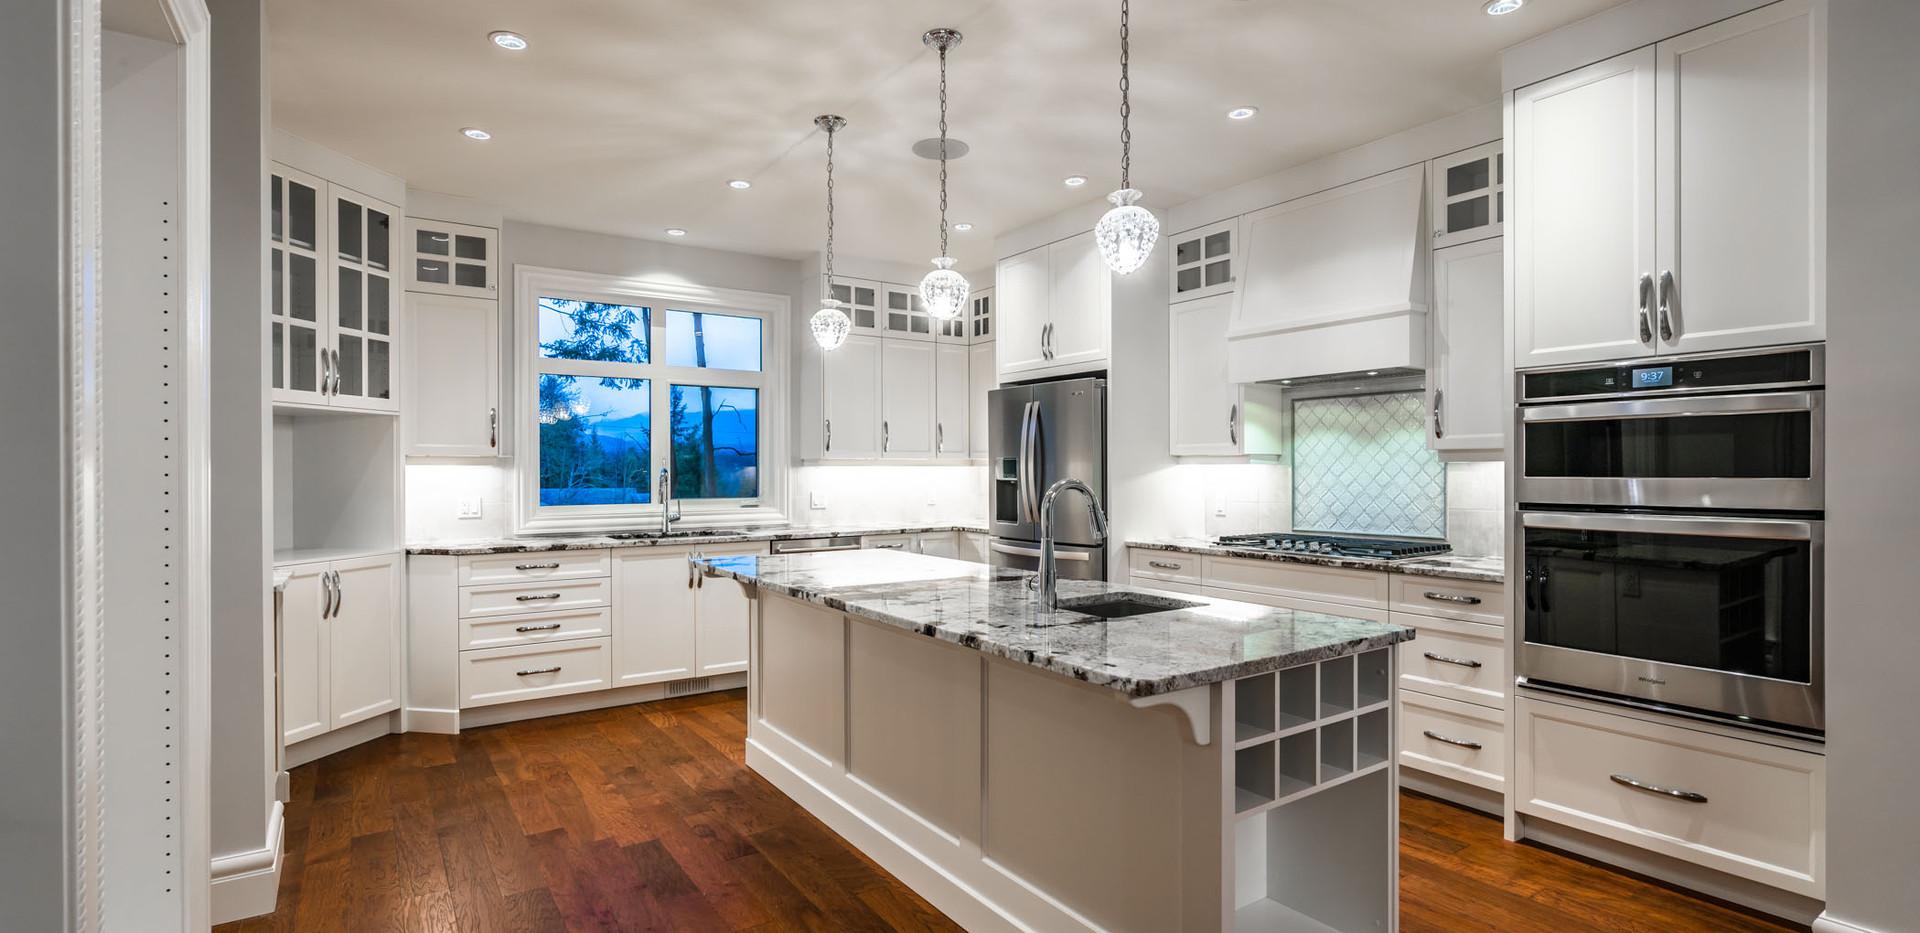 2847 Ashcraft Main House Kitchen16.jpg